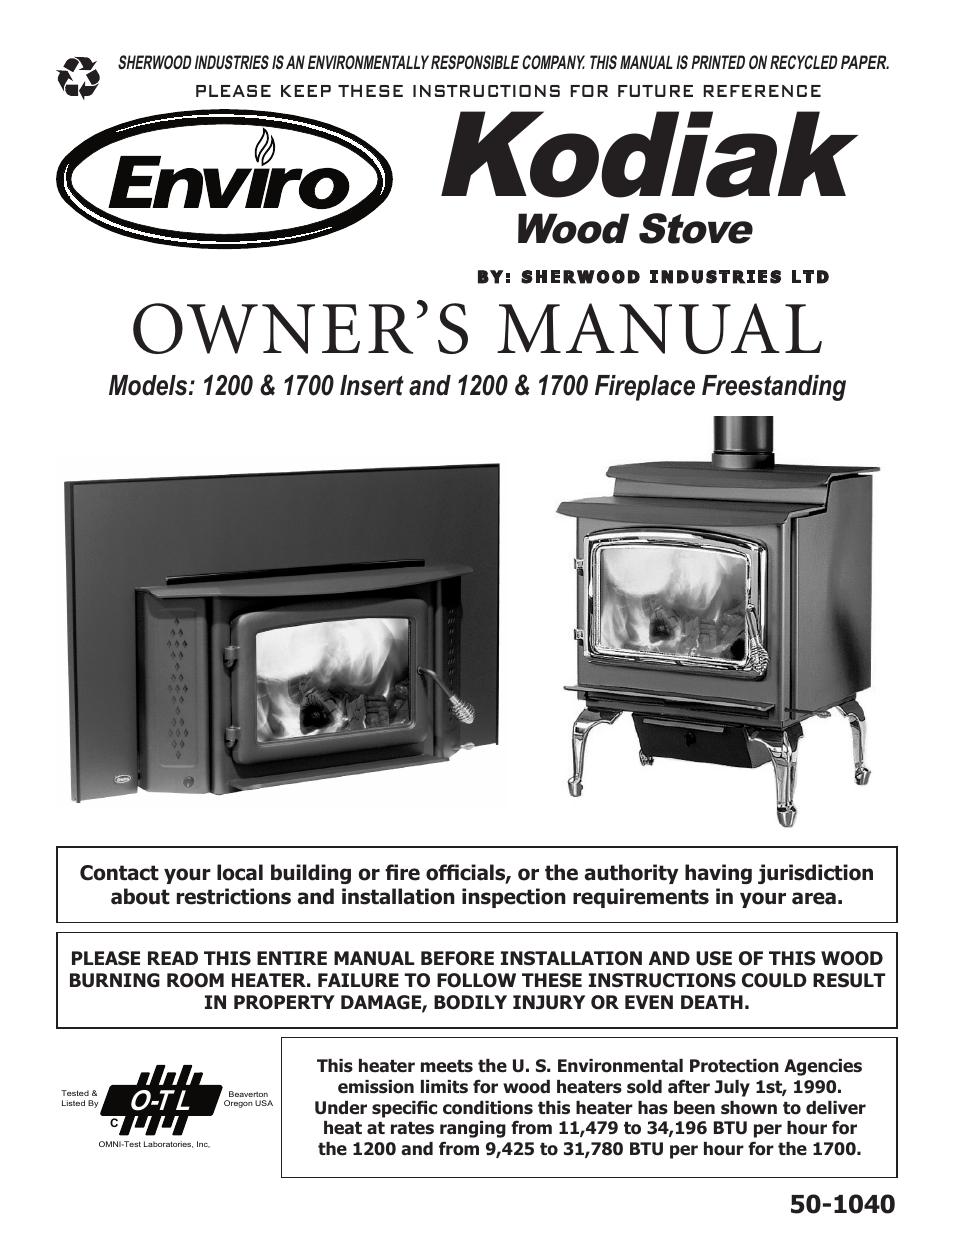 Enviro Kodiak 1700 Fireplace Freestanding User Manual